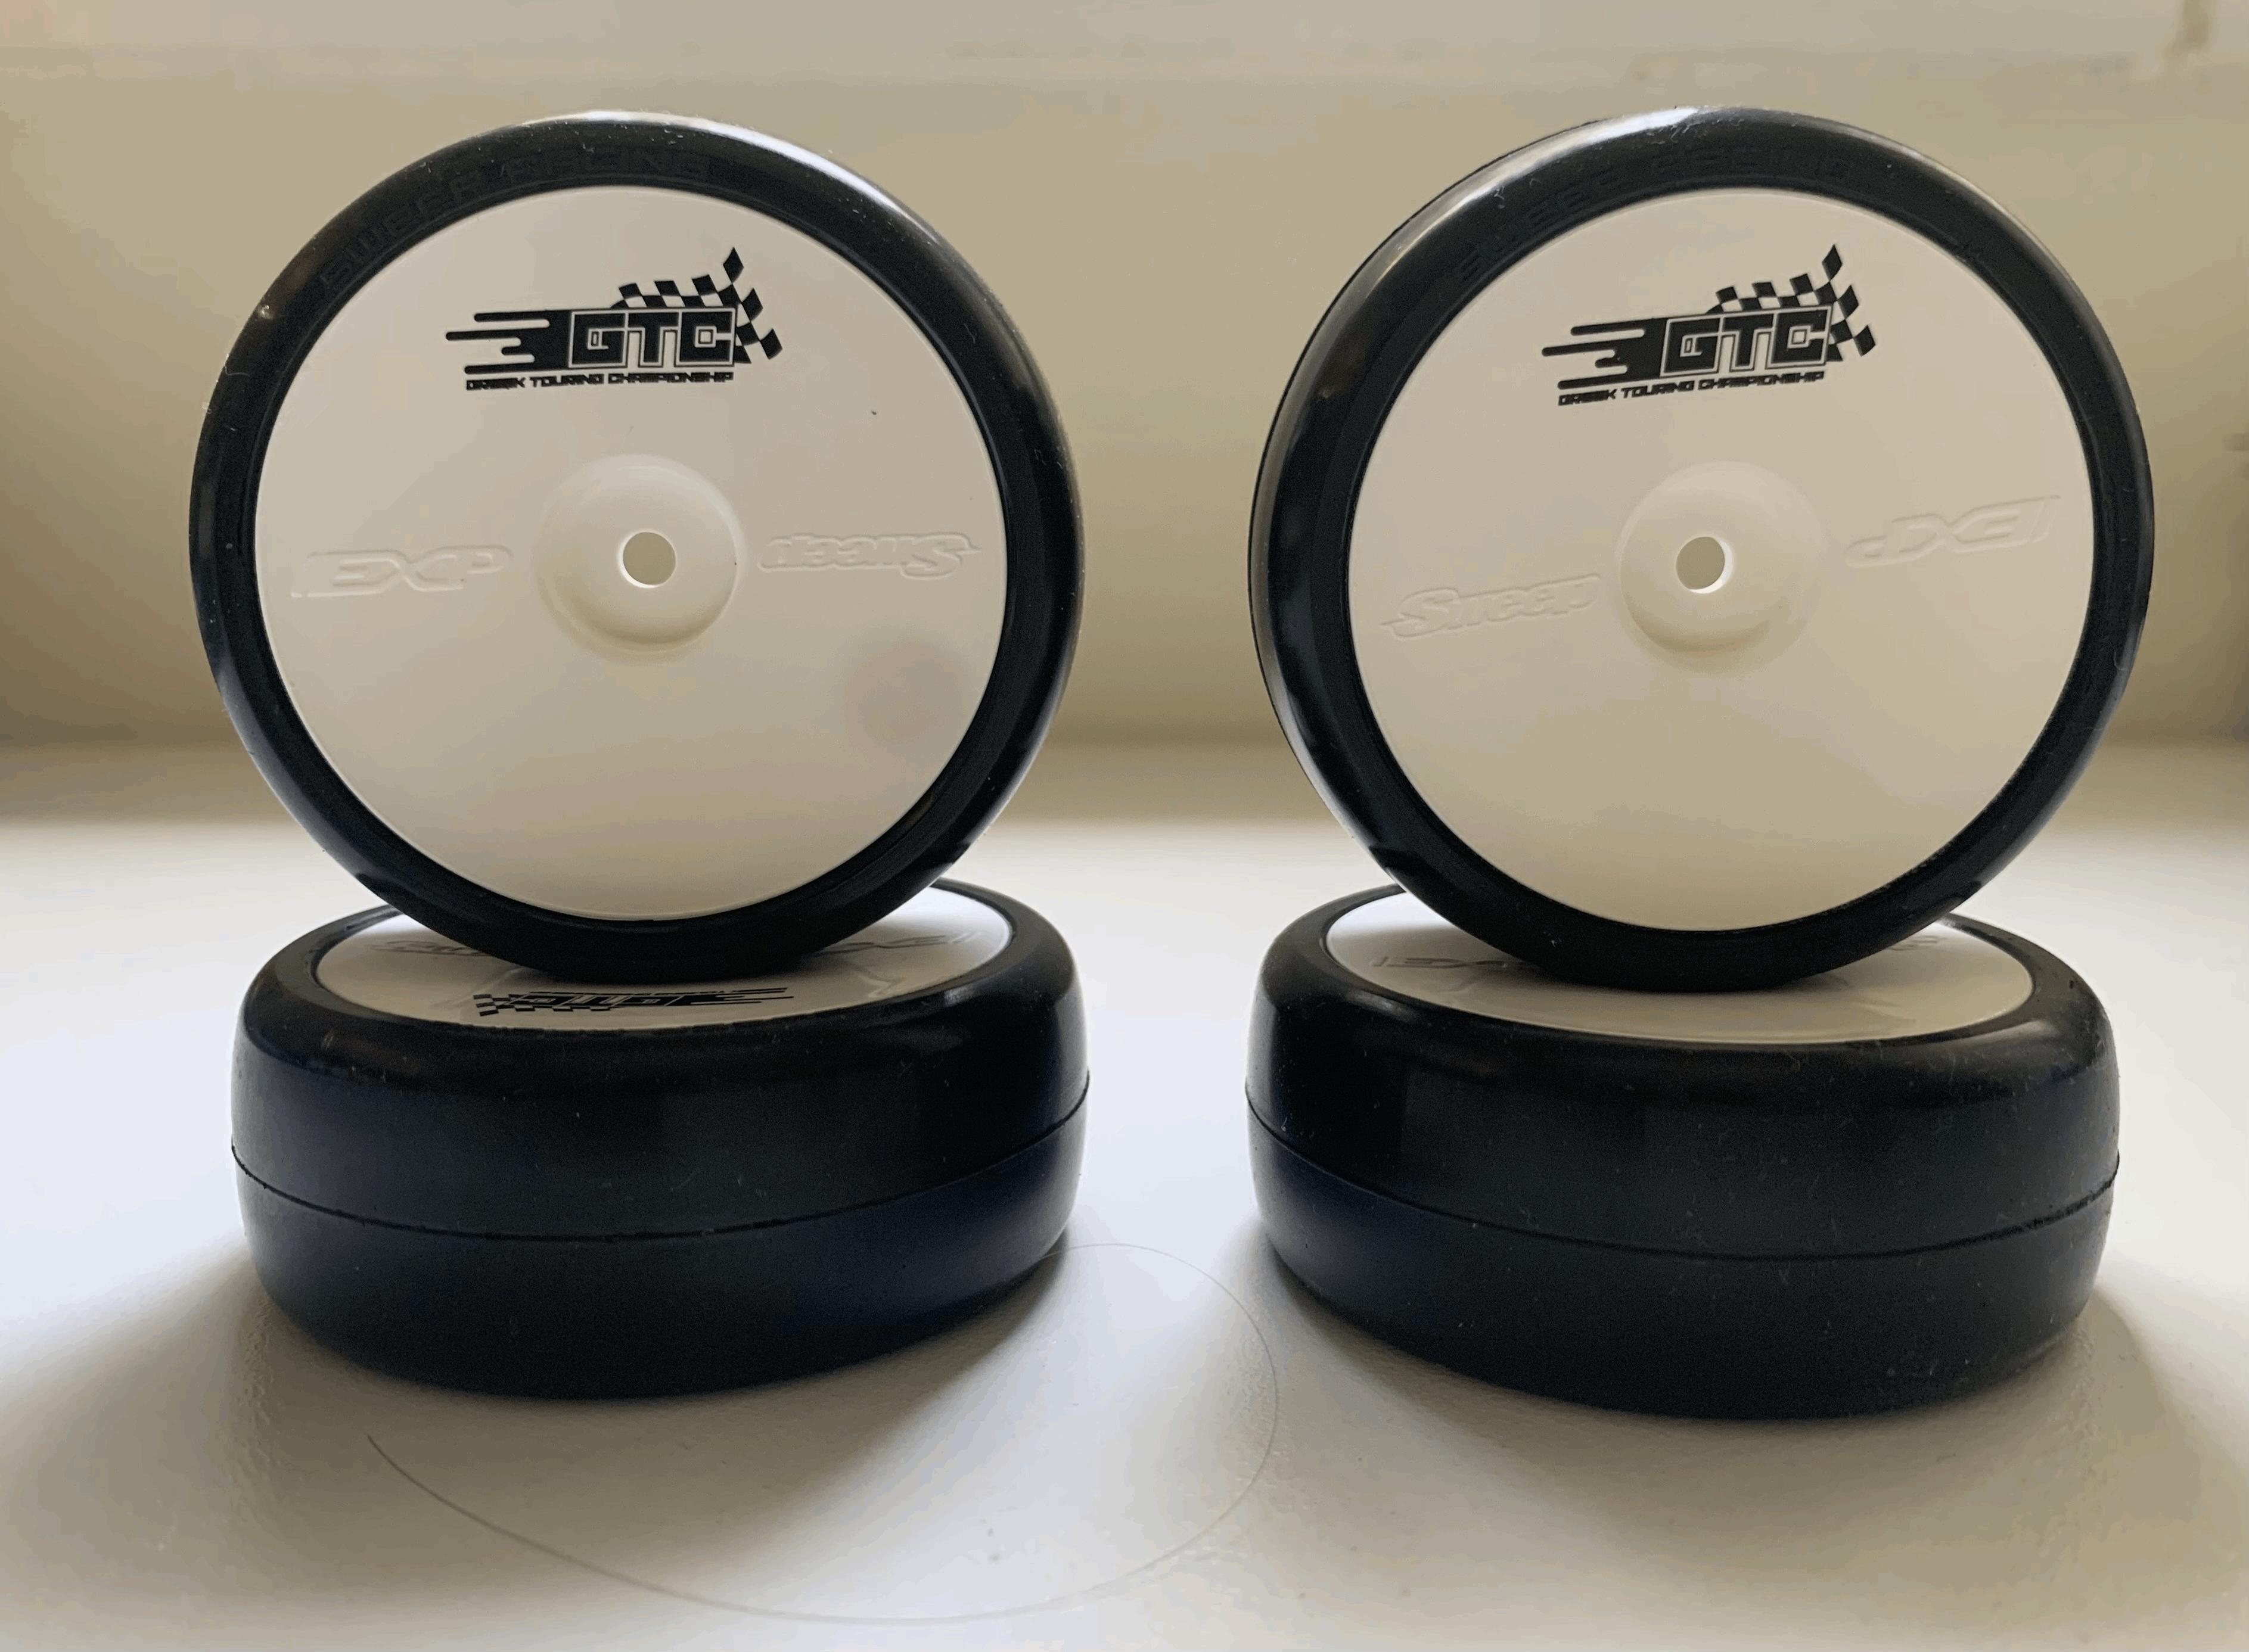 Sweep EXX-R3 Highend Pre-Glued Touring Car Tires (36deg, EXP-SX Inserts, 4pcs) GTC